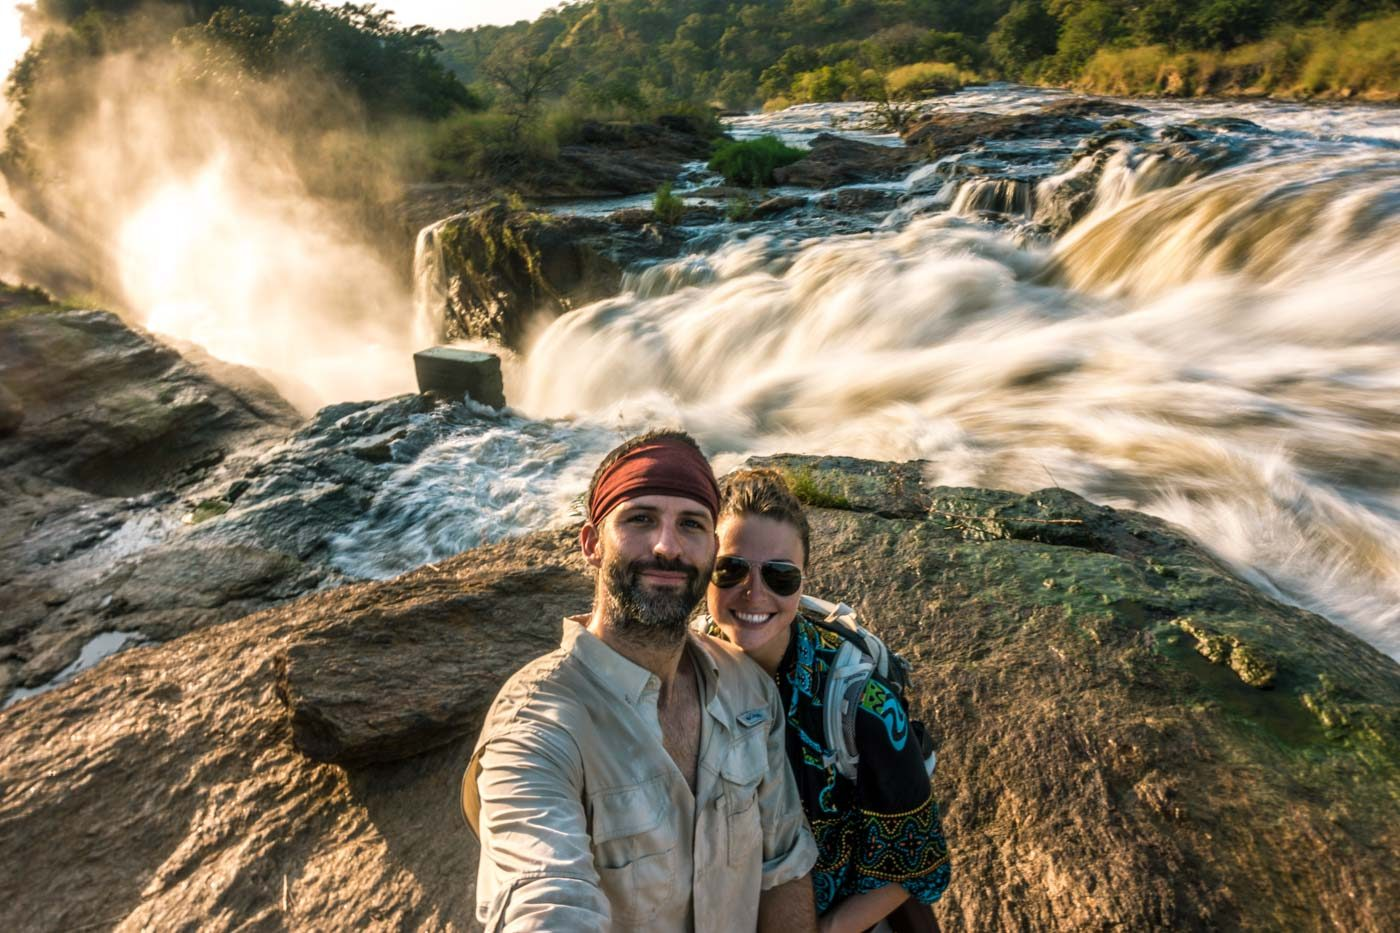 At Murchison Falls in Uganda